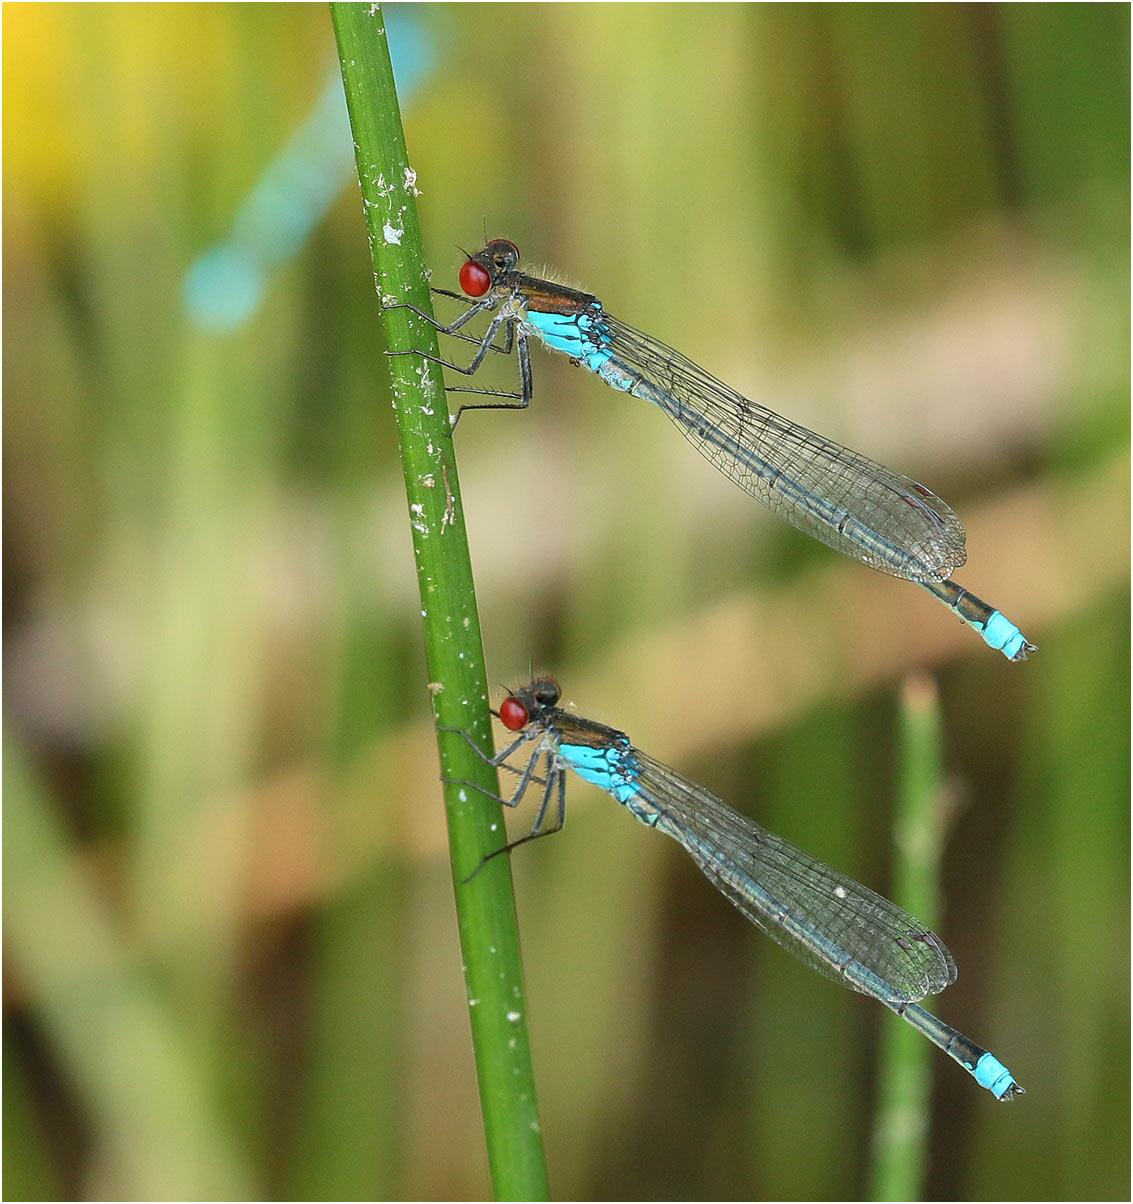 Erythromma najas mâles, Gennes sur Loire, 31/07/2020